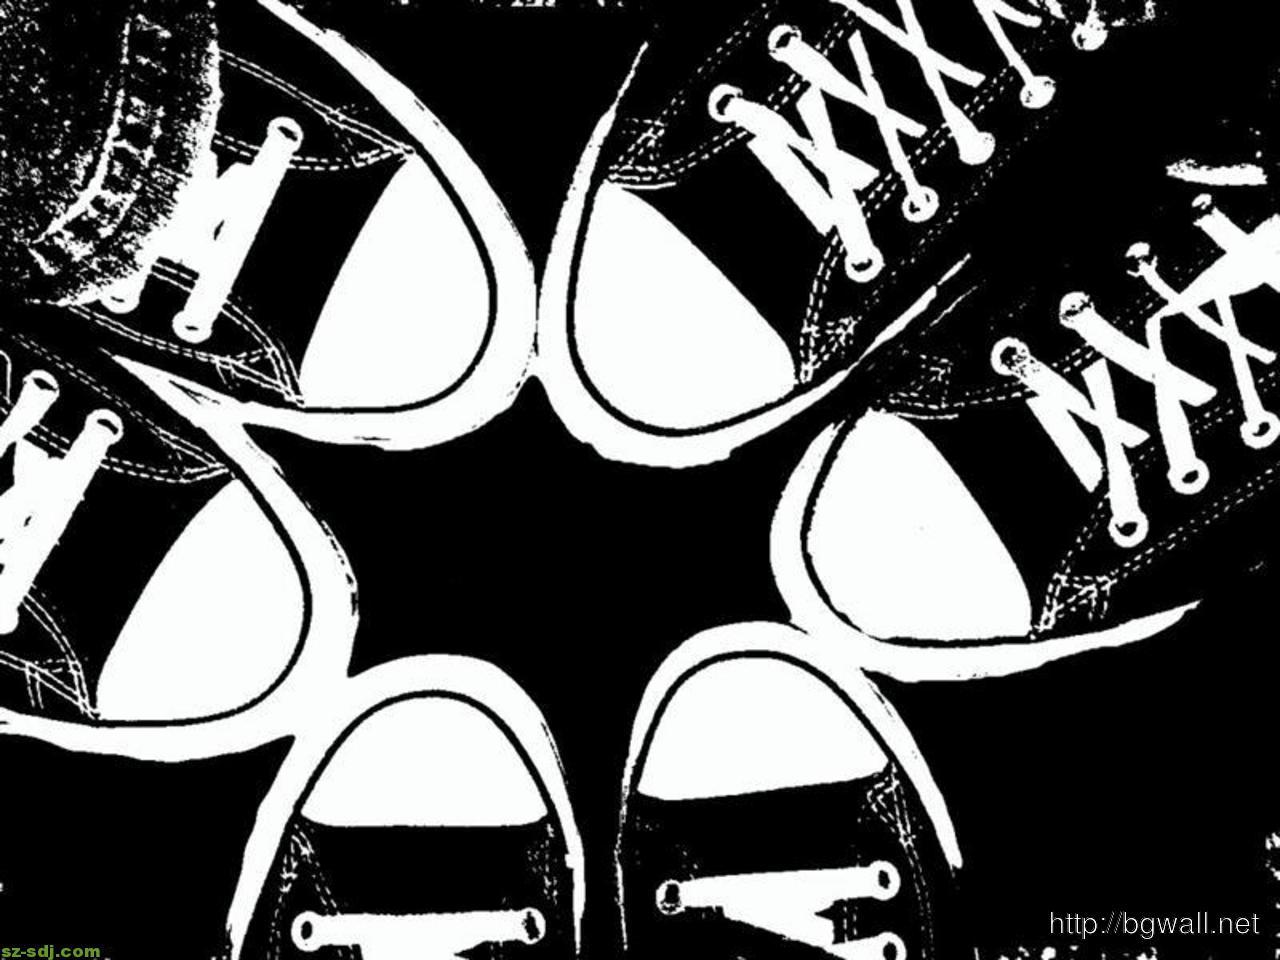 black-shoes-image-wallpaper